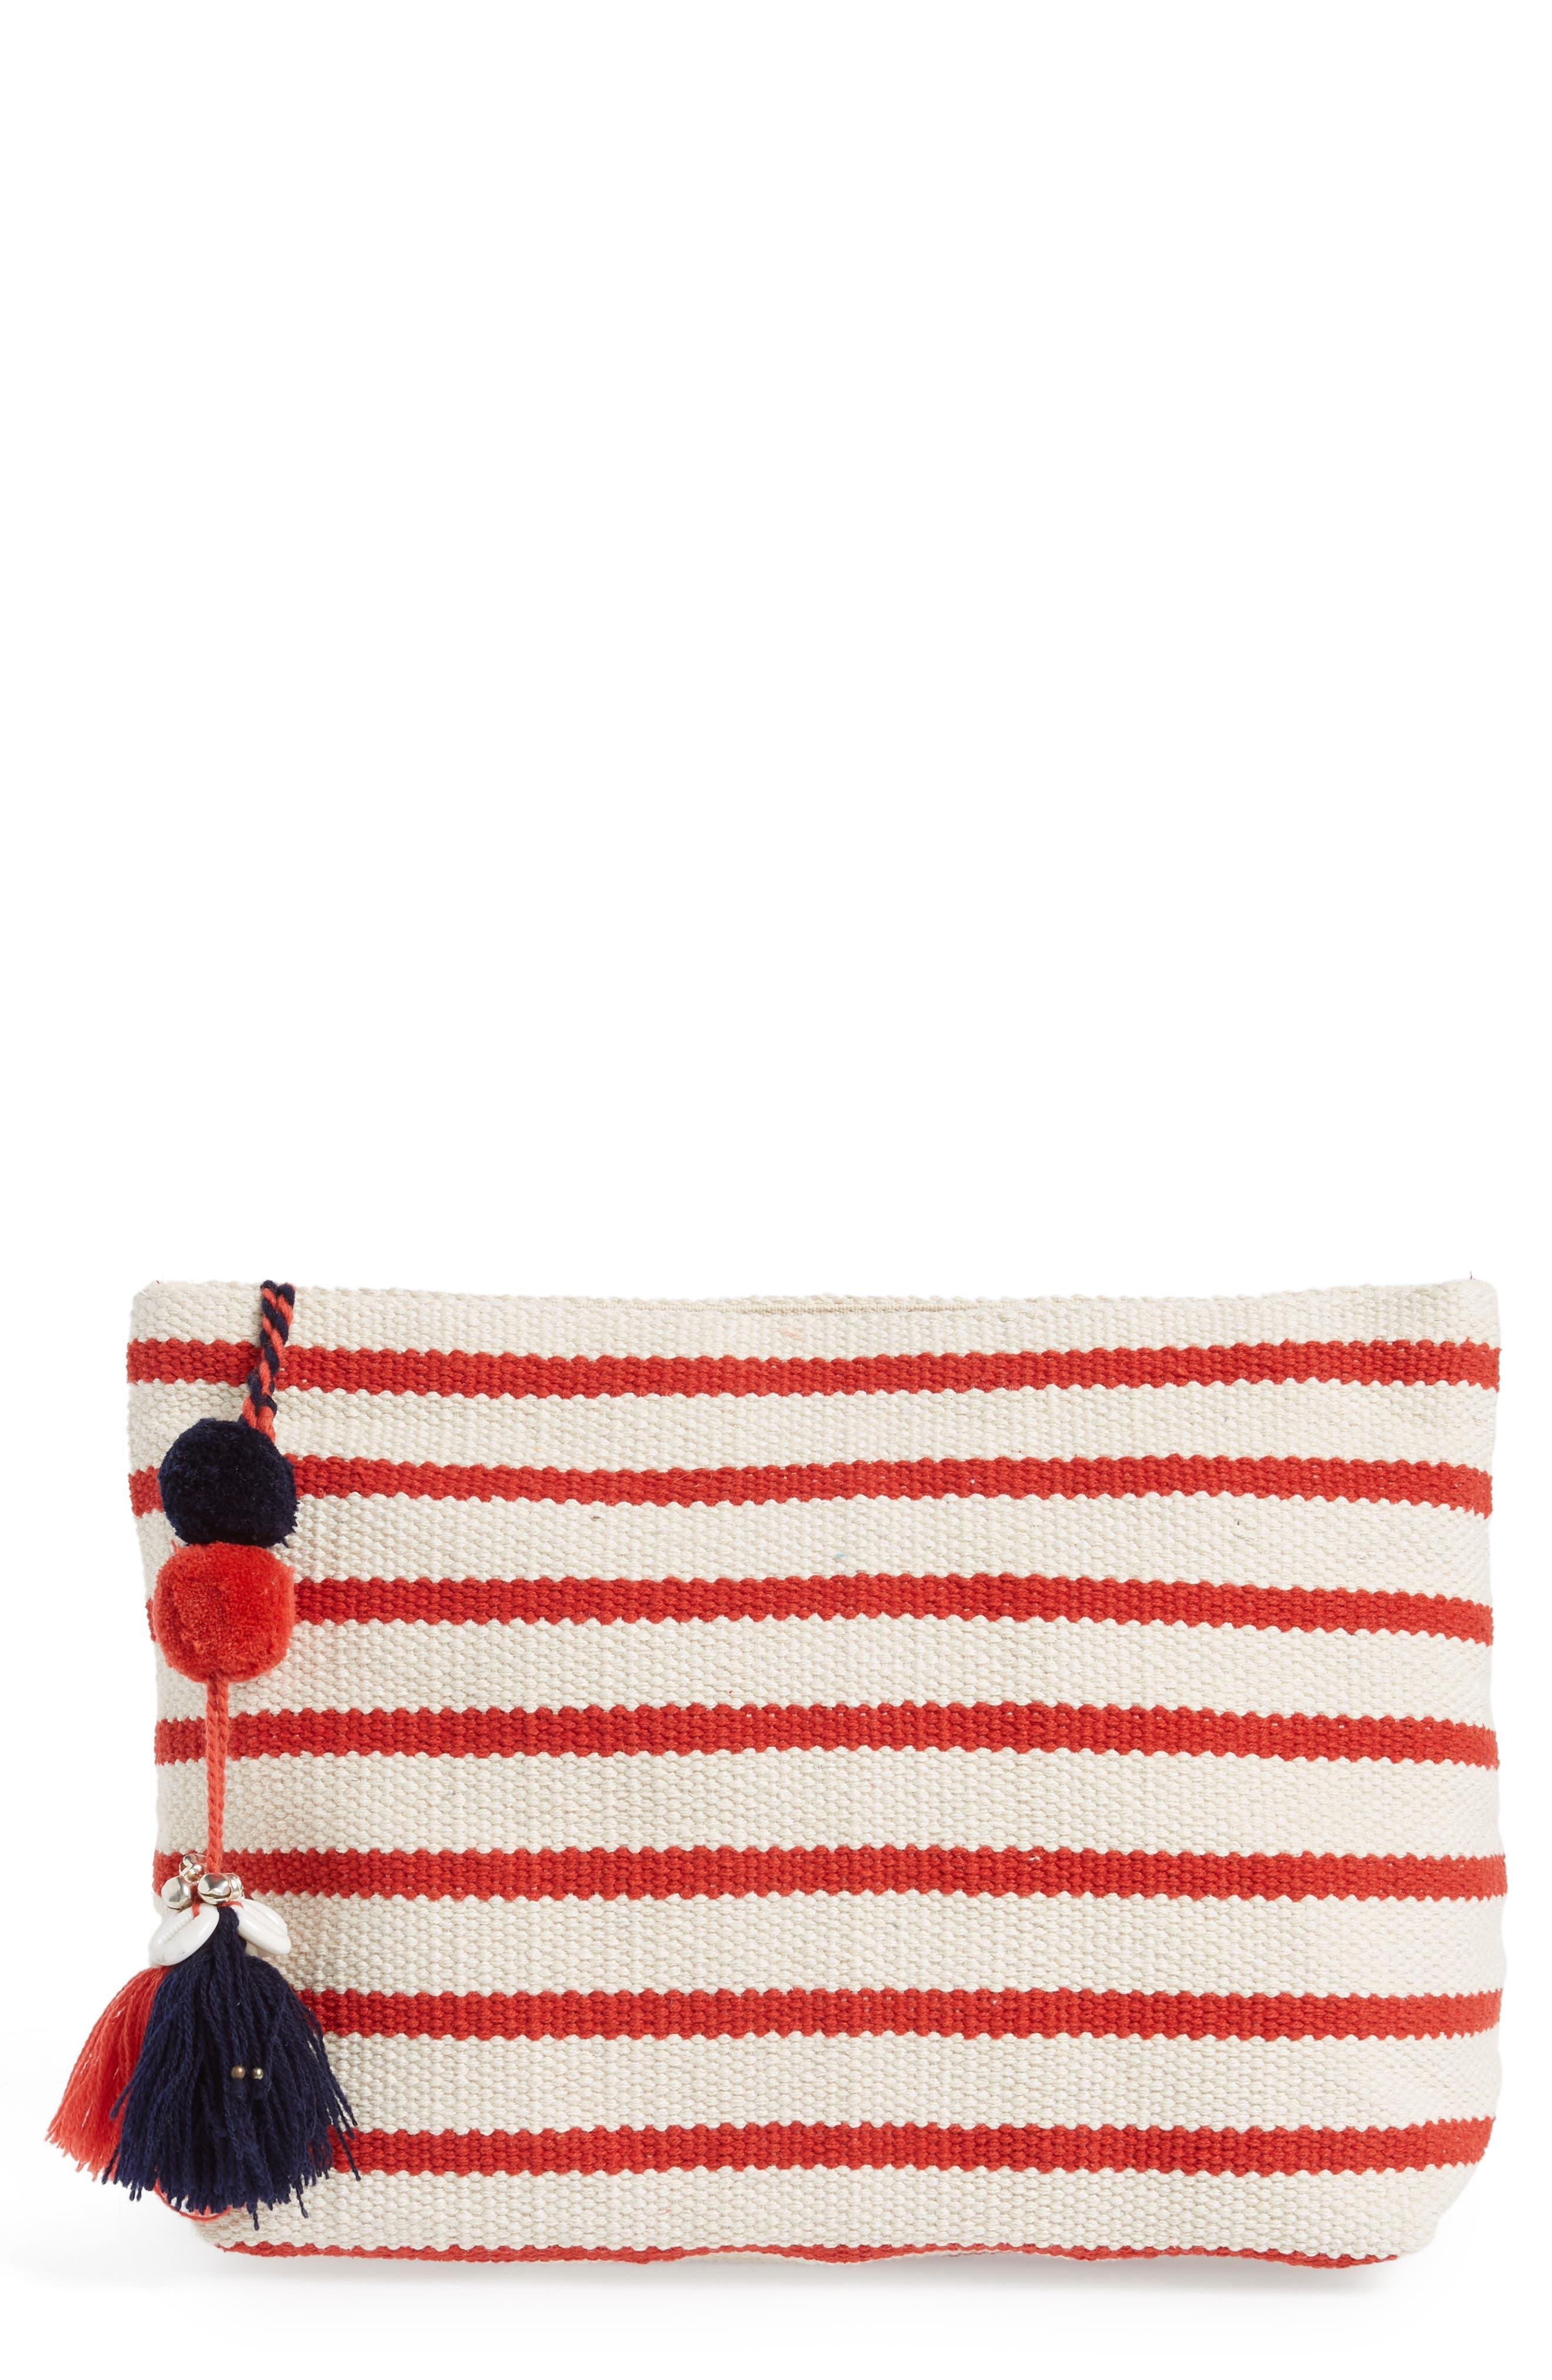 Montauk Woven Zip Pouch,                         Main,                         color, 600